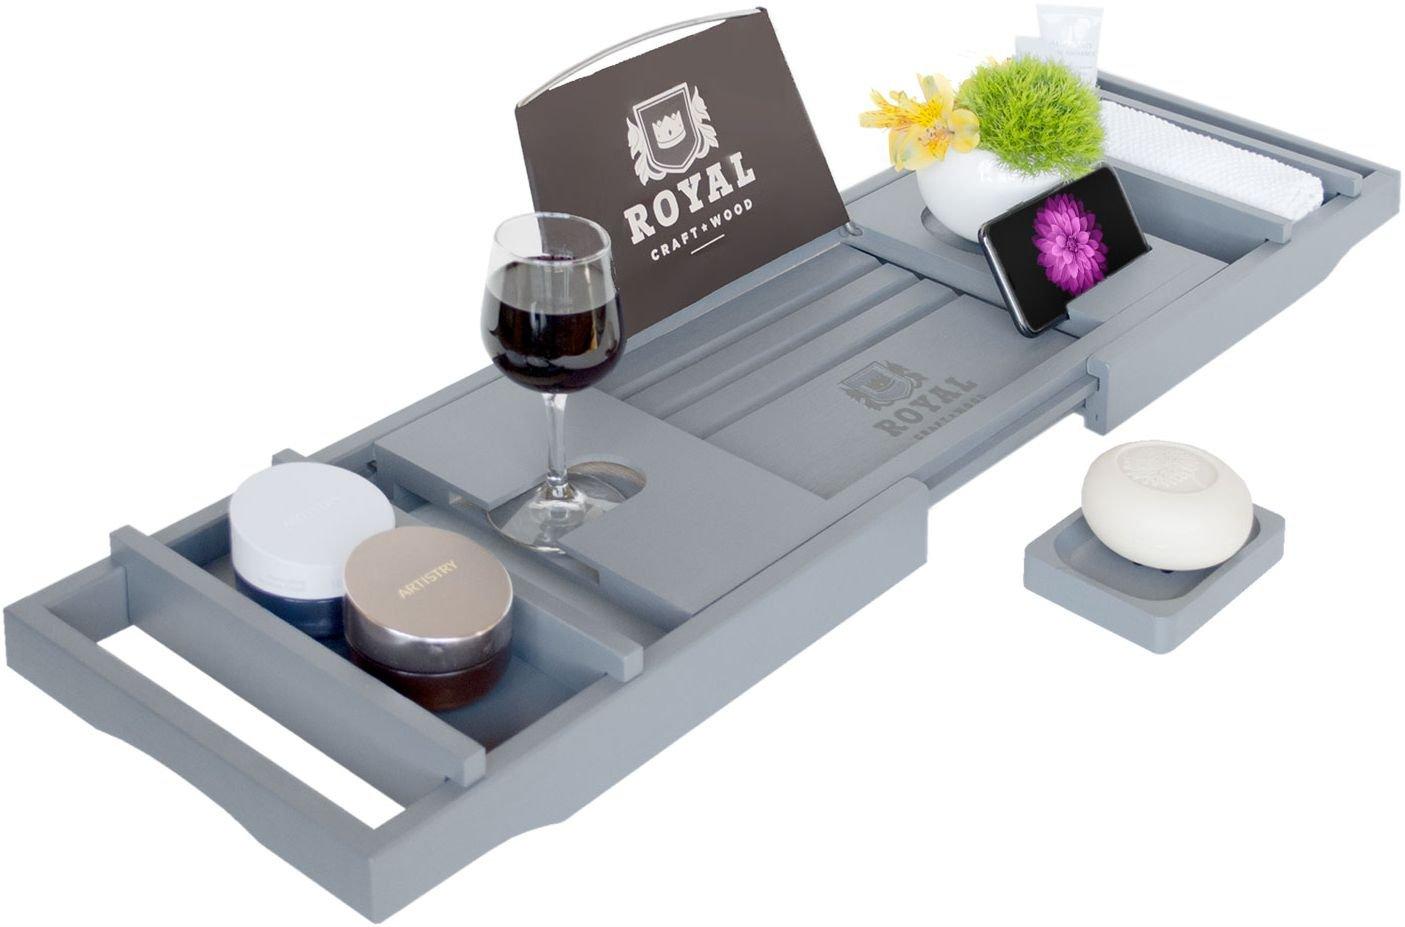 Best bath table for tub | Amazon.com